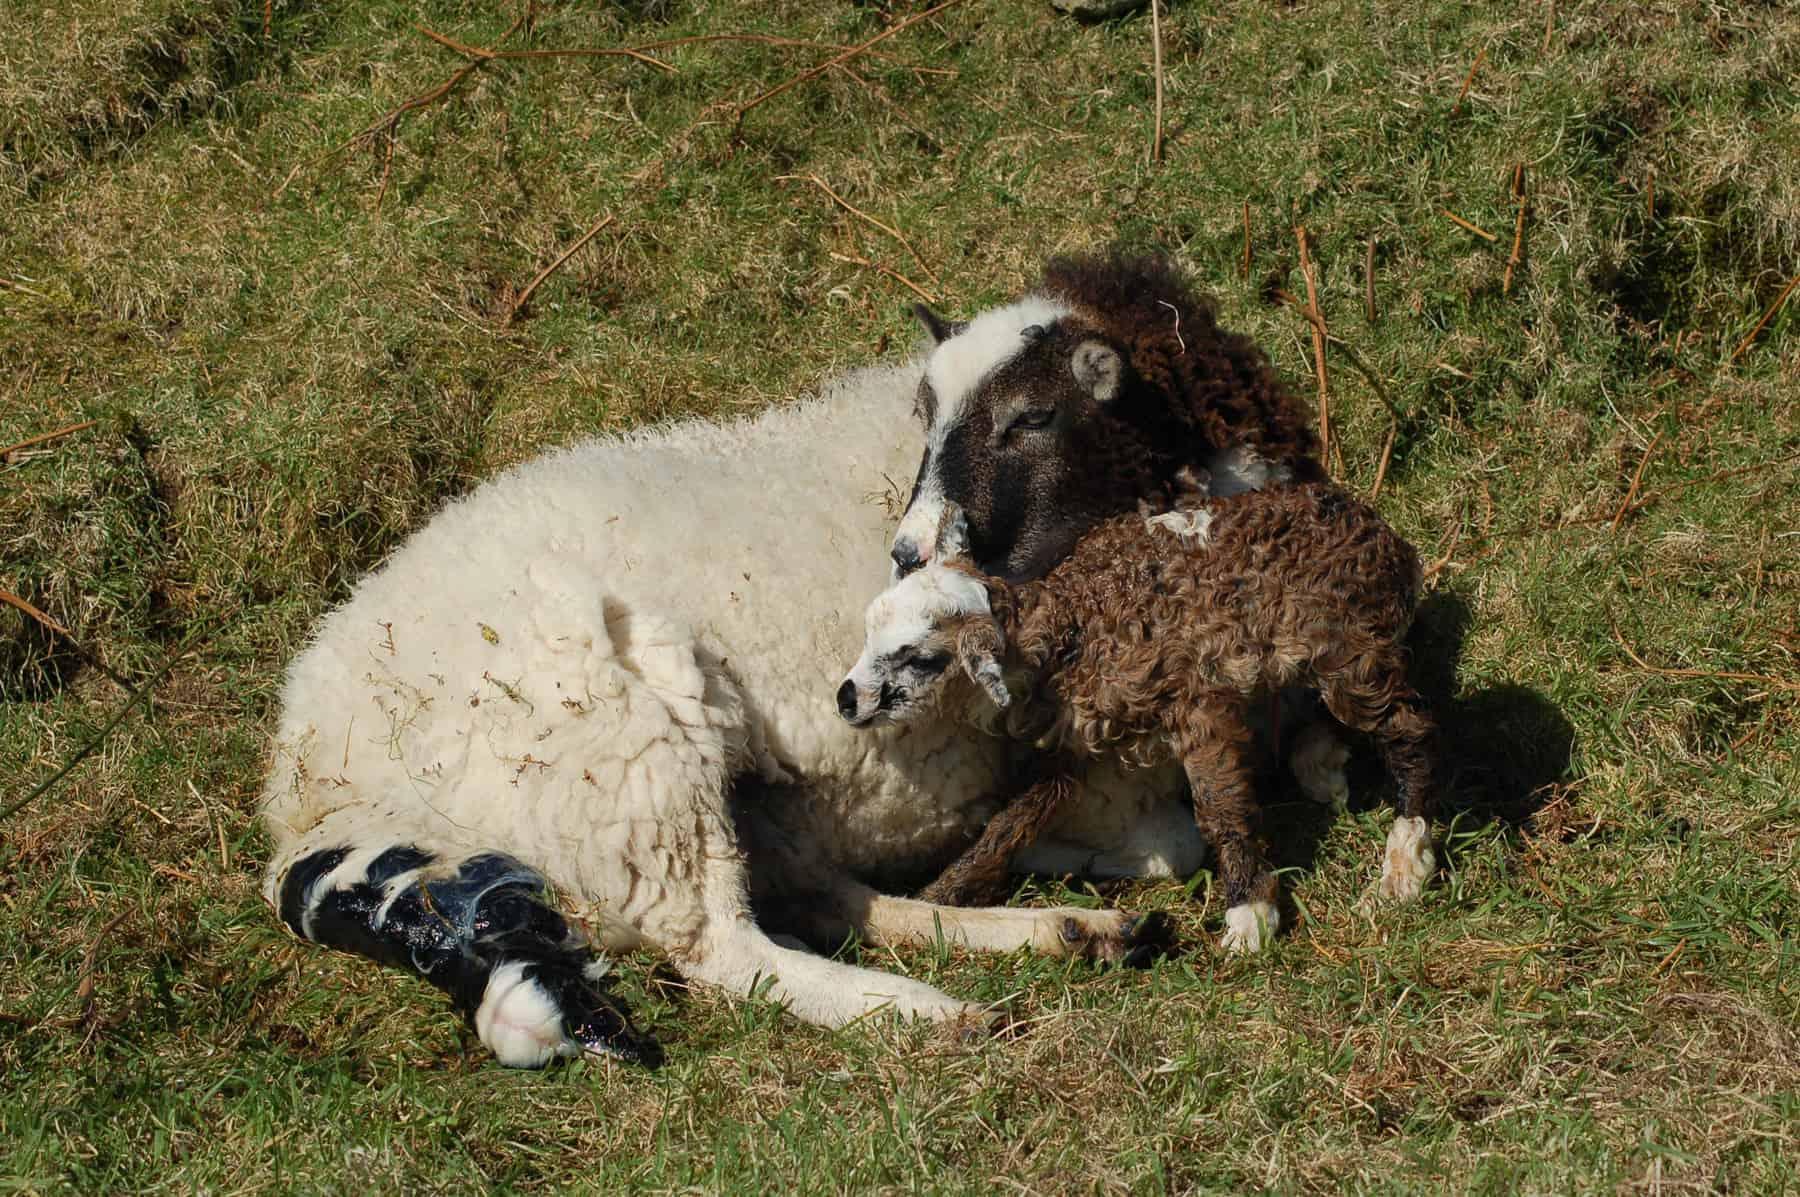 patchwork sheep soay cross shetland spotted ewe Fern newborn lambs